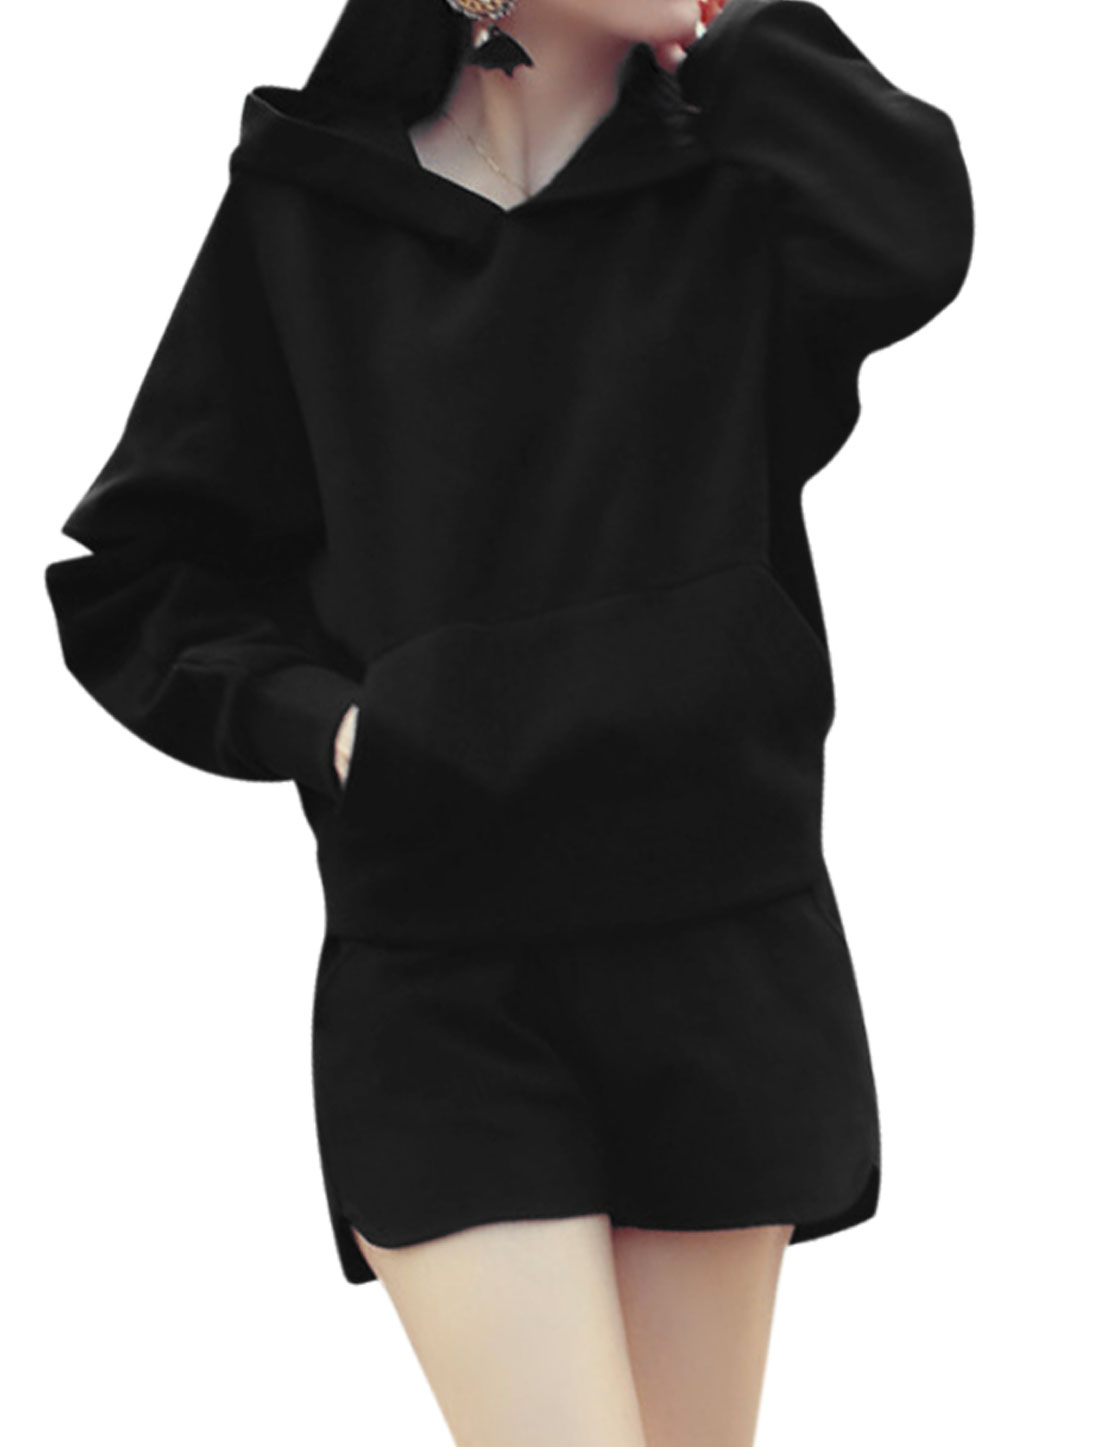 Women Long Batwing Hooded Top w Elastic Waist Shorts Sets Black XS